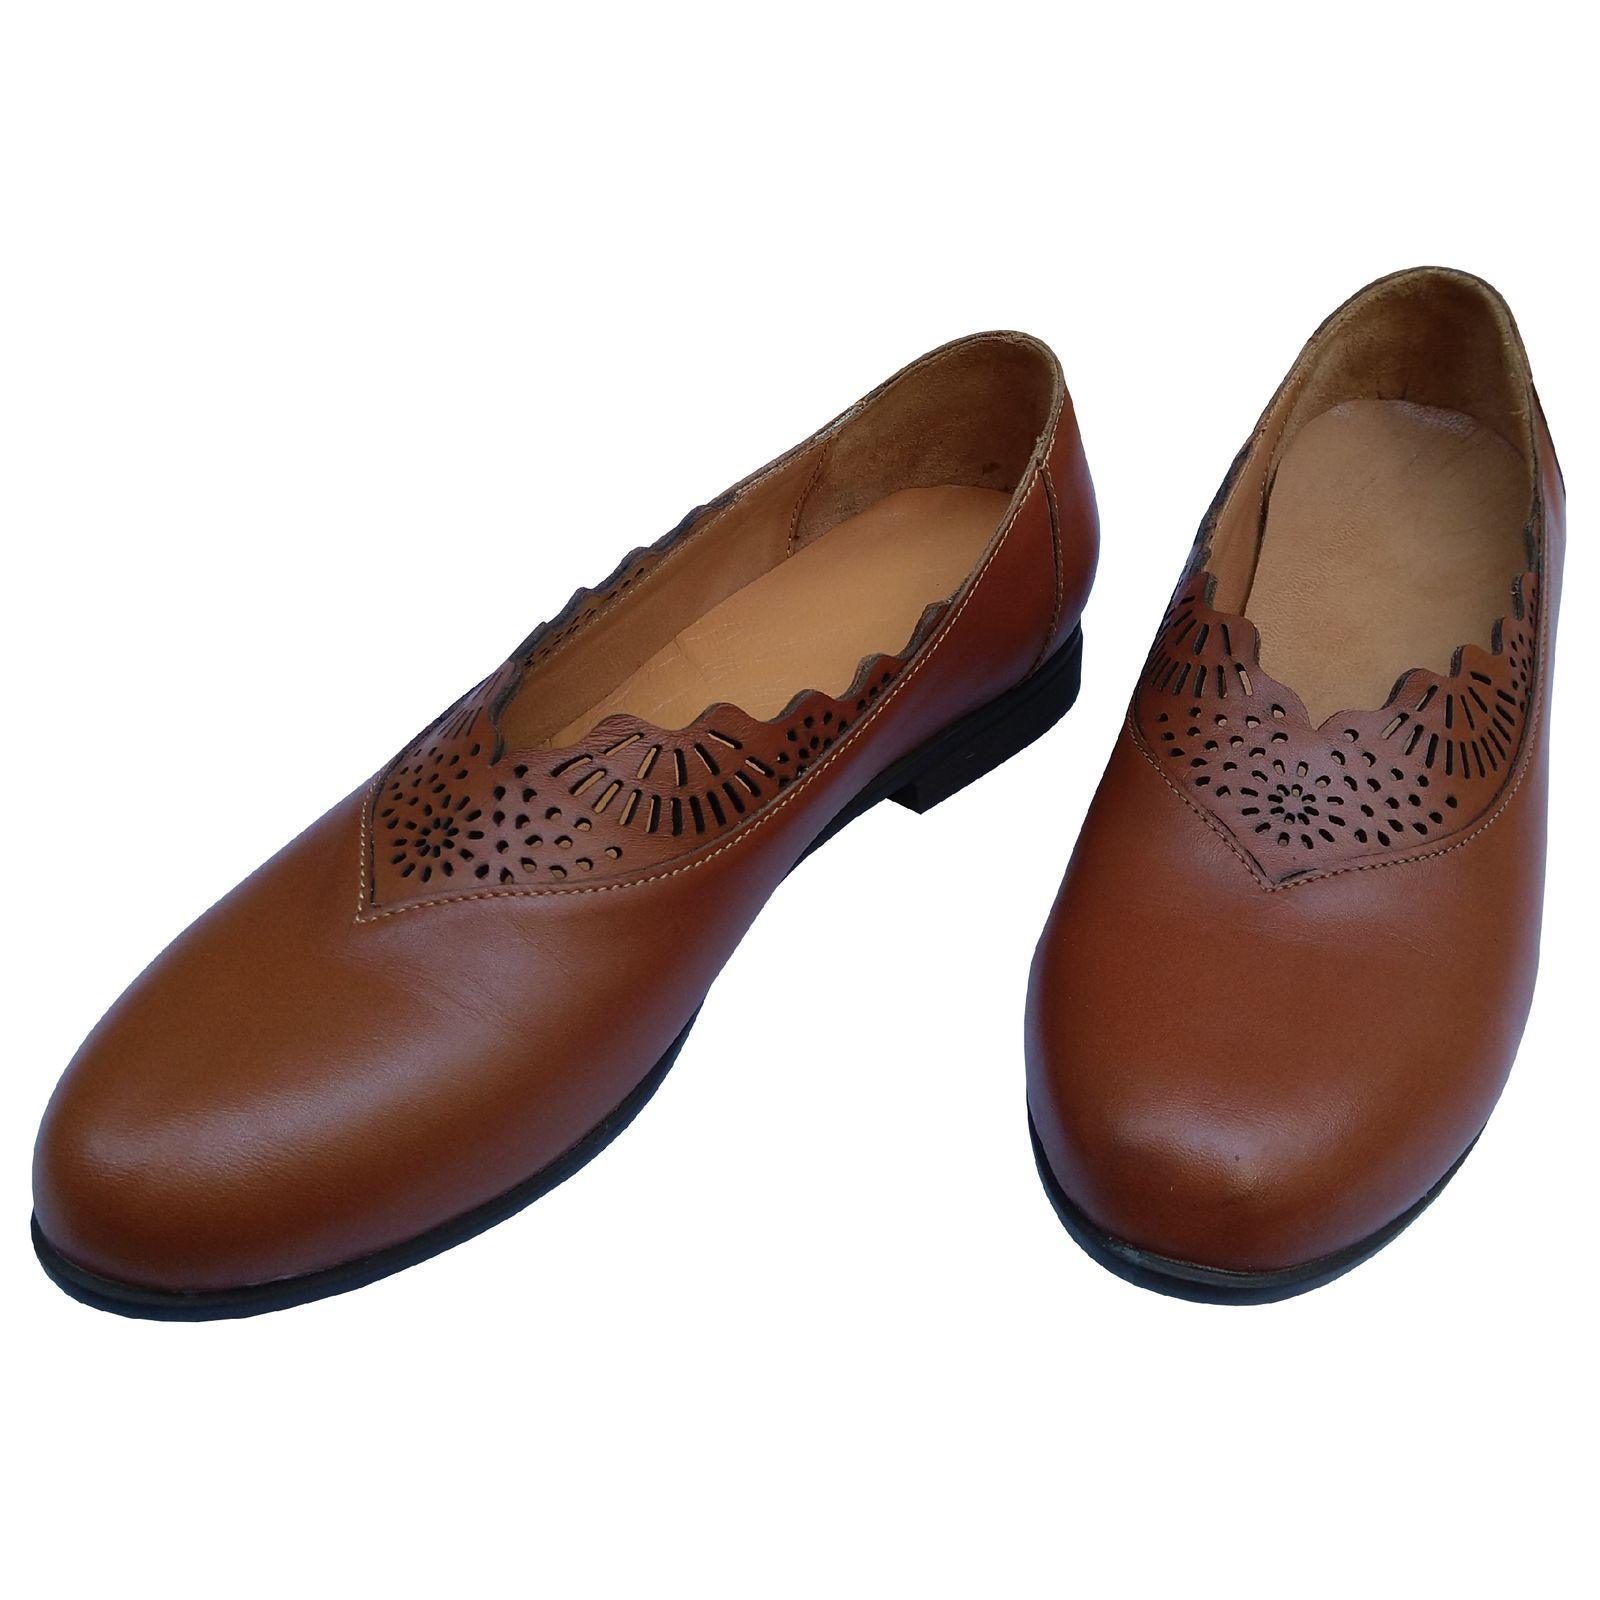 کفش زنانه مدل SK 307 -  - 7